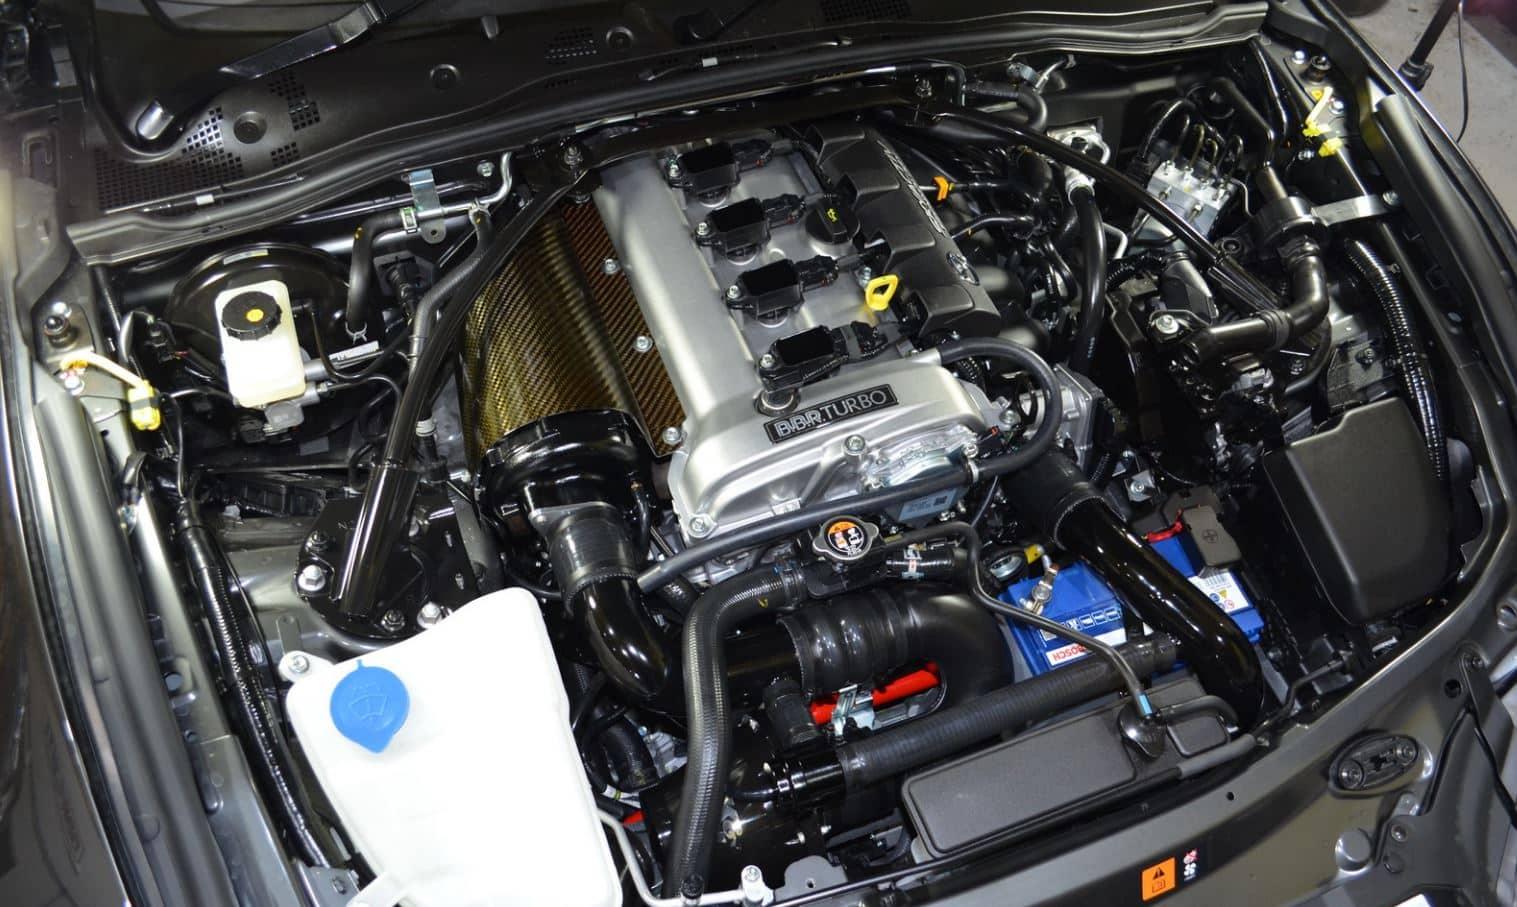 MX5 Turbo ND 3